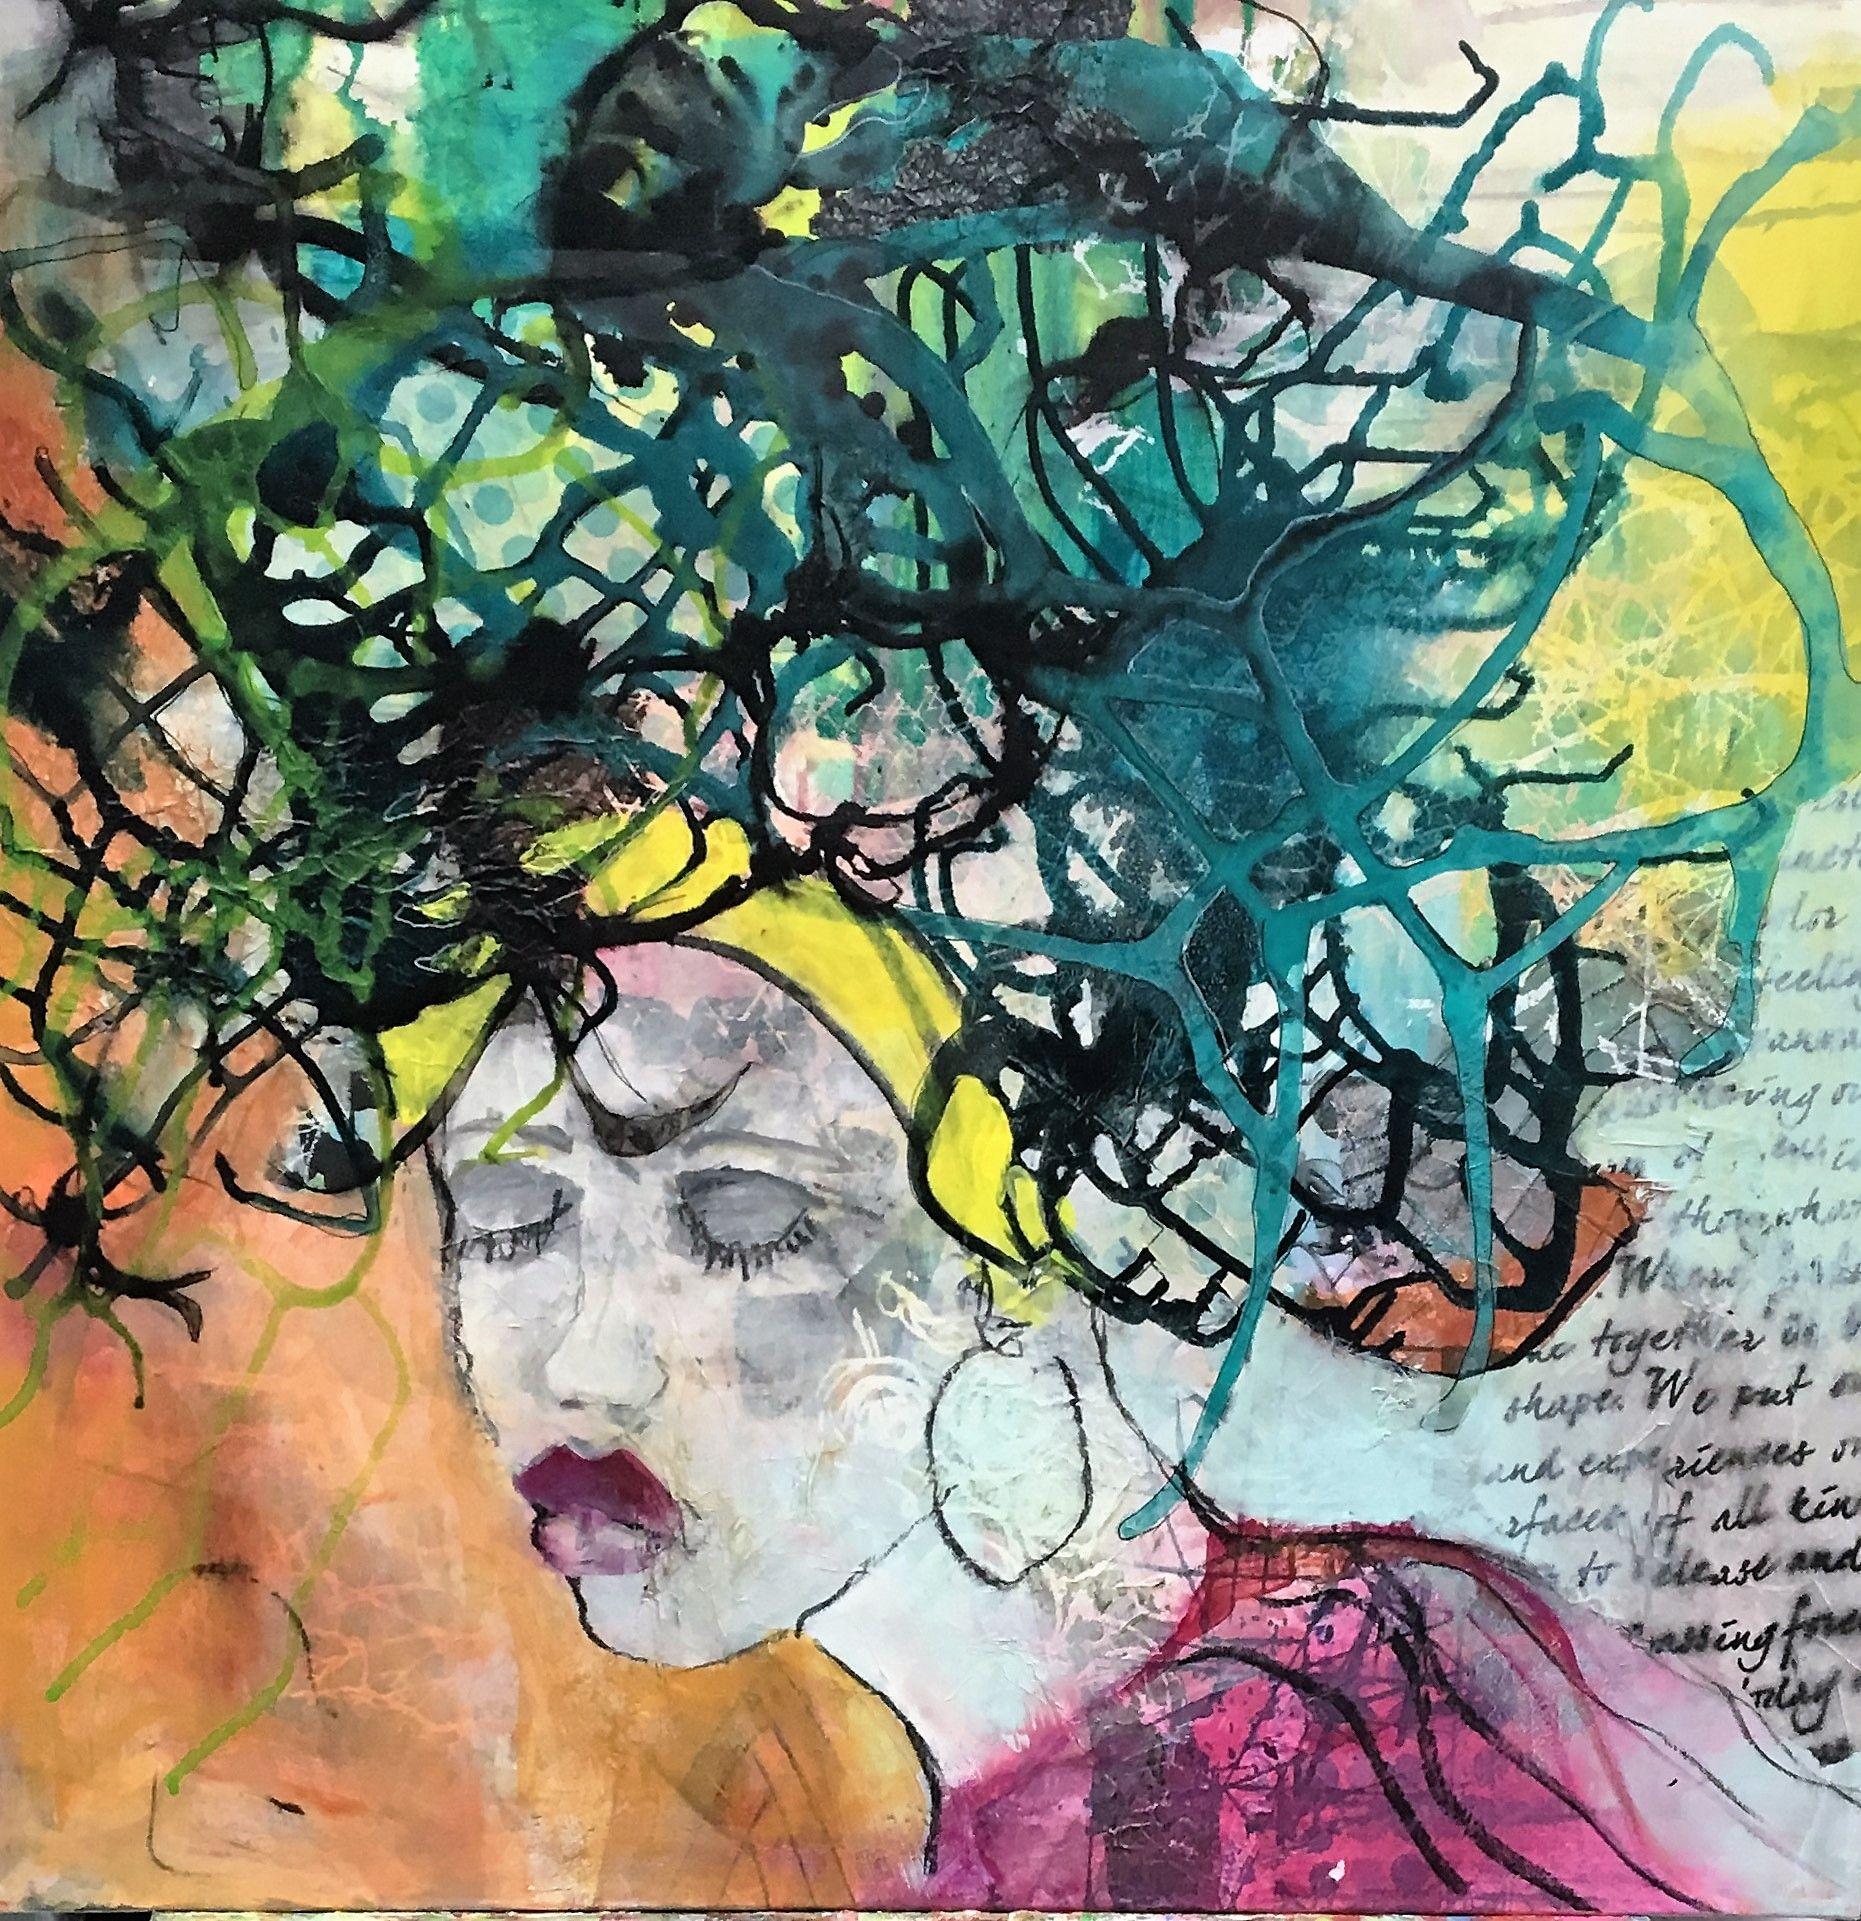 Art for saleAkryl maleri str 70x70 Malet af kunstner Annemette Hoier Nielsen http://www.ahn-univers.dk/2172104